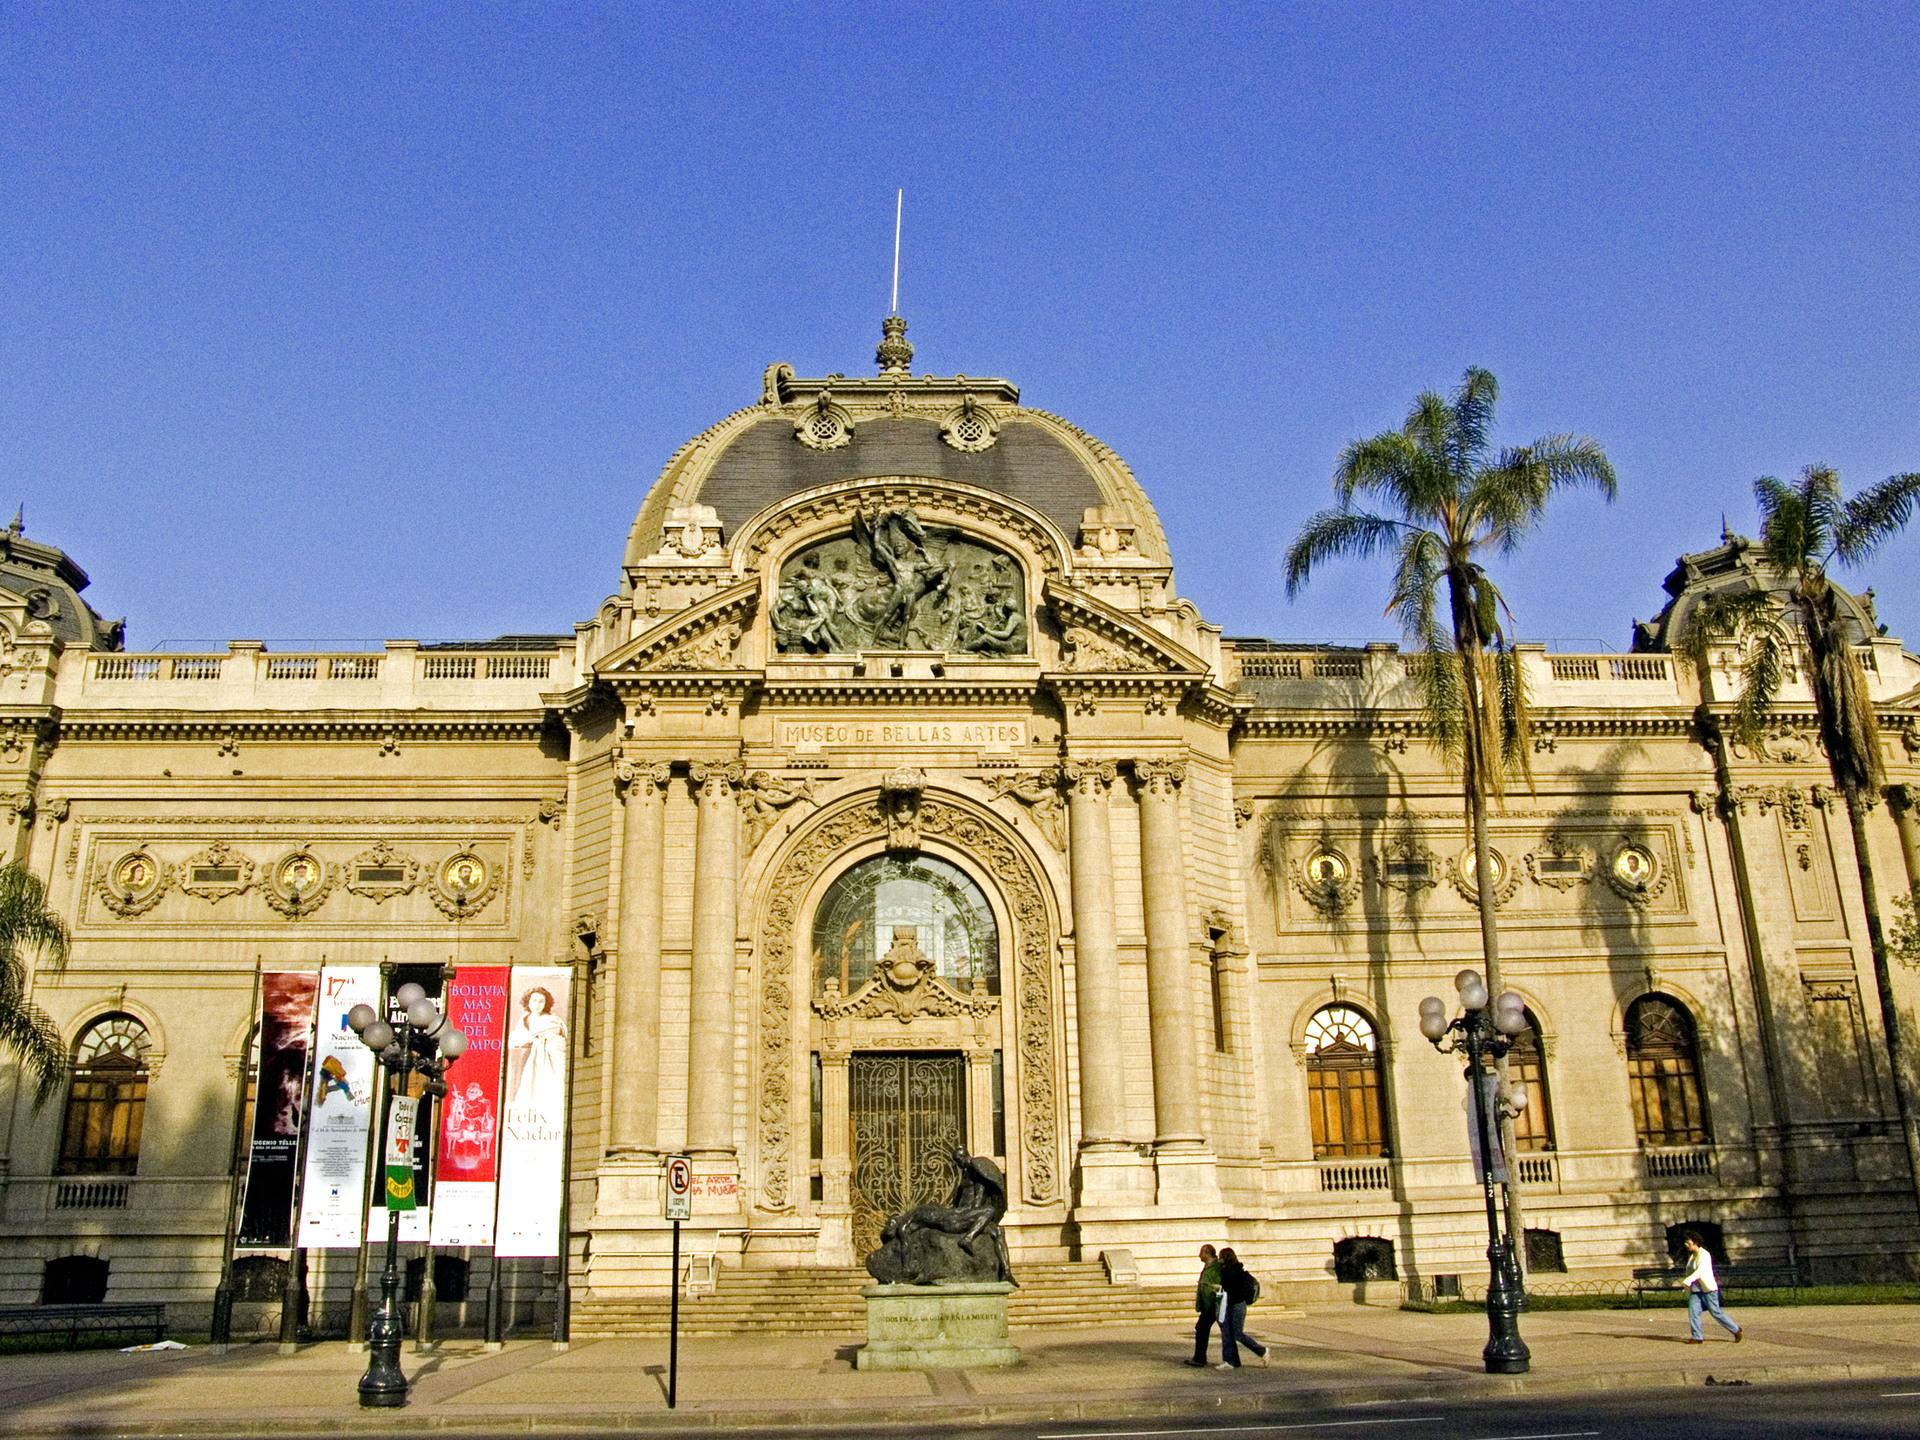 Museu de Belas Artes de Santiago